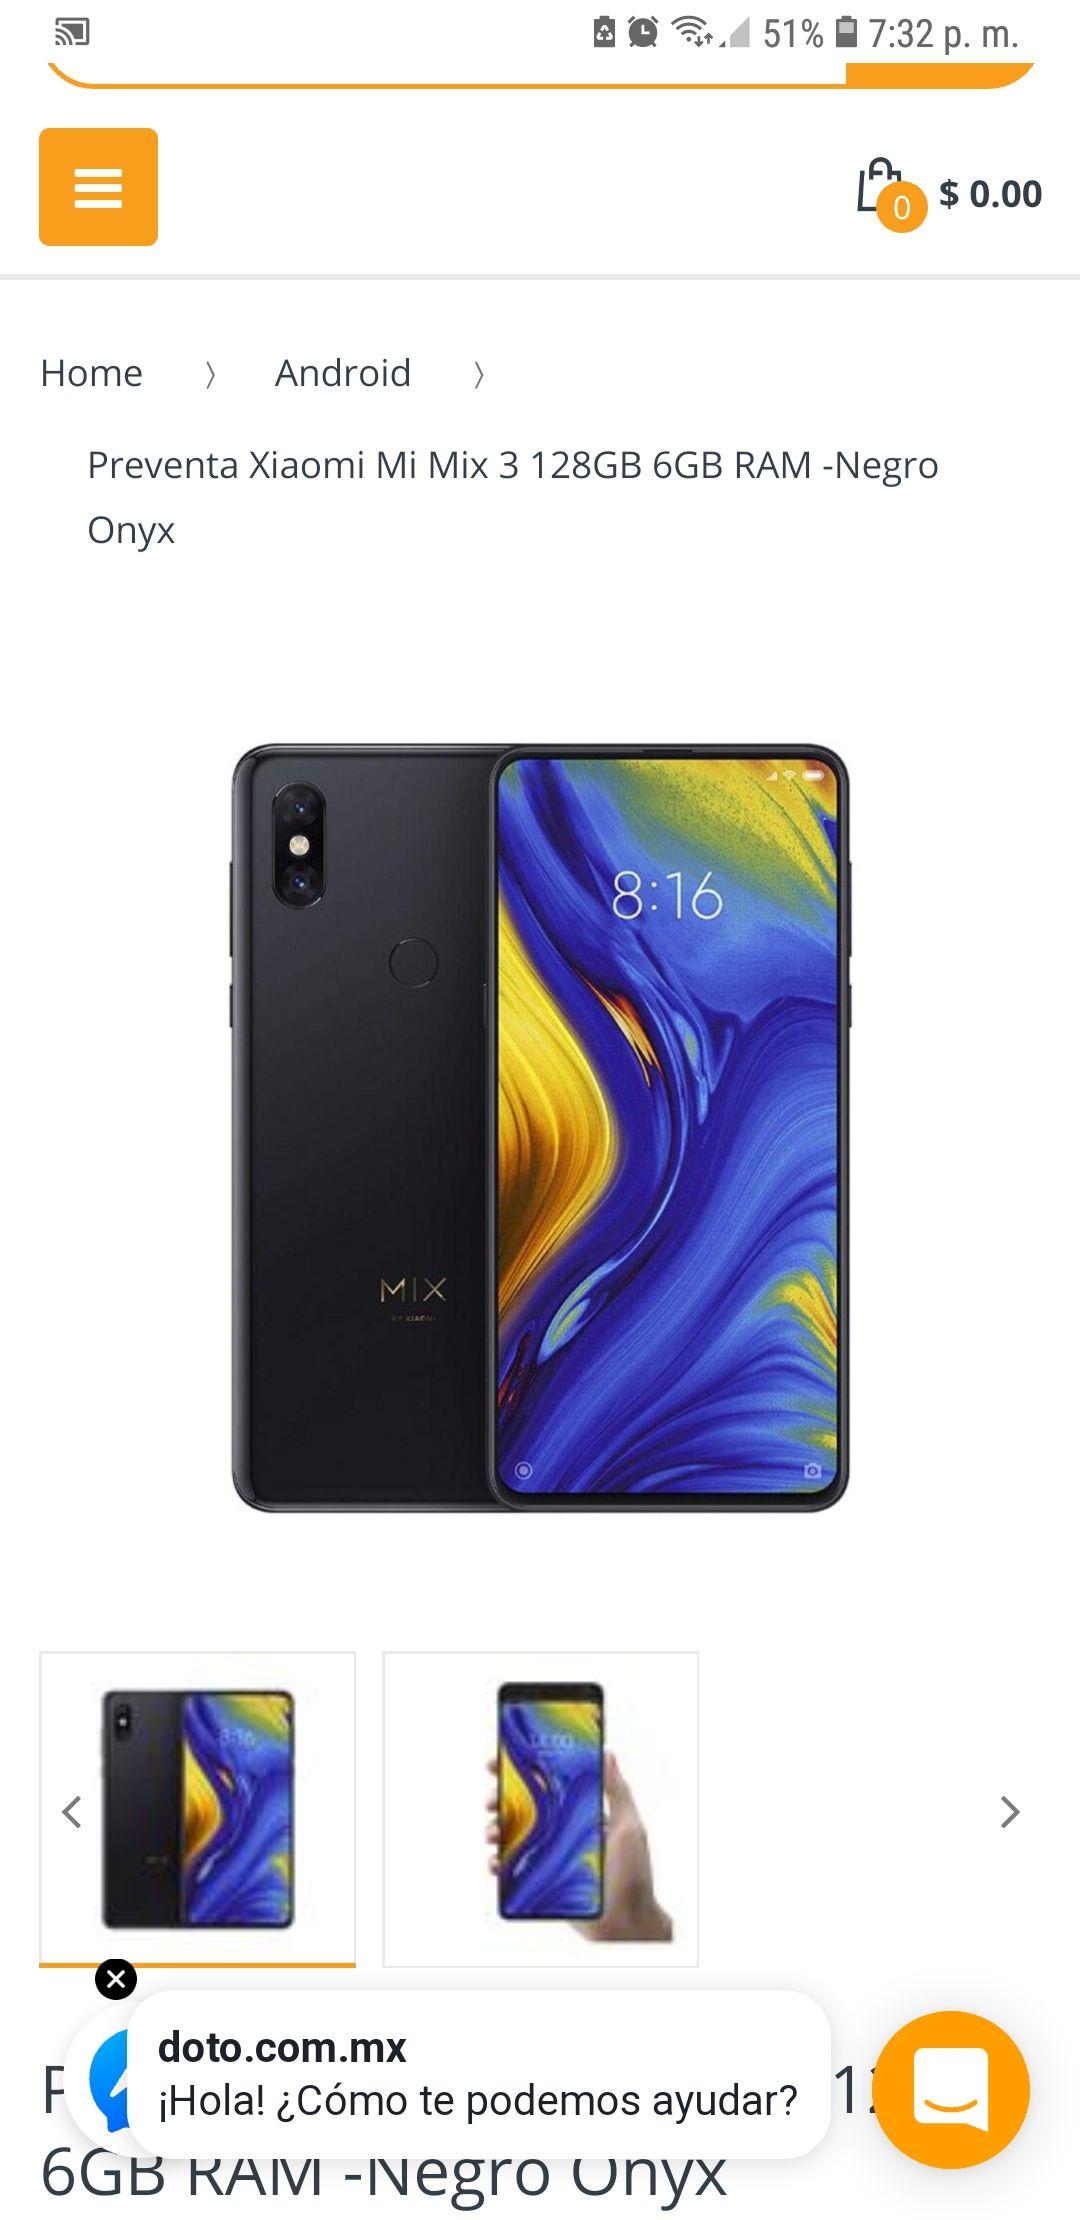 Doto: Xiaomi Mi Mix 3 6GB/128GB Negro Onyx envío DHL gratis sin aduanas